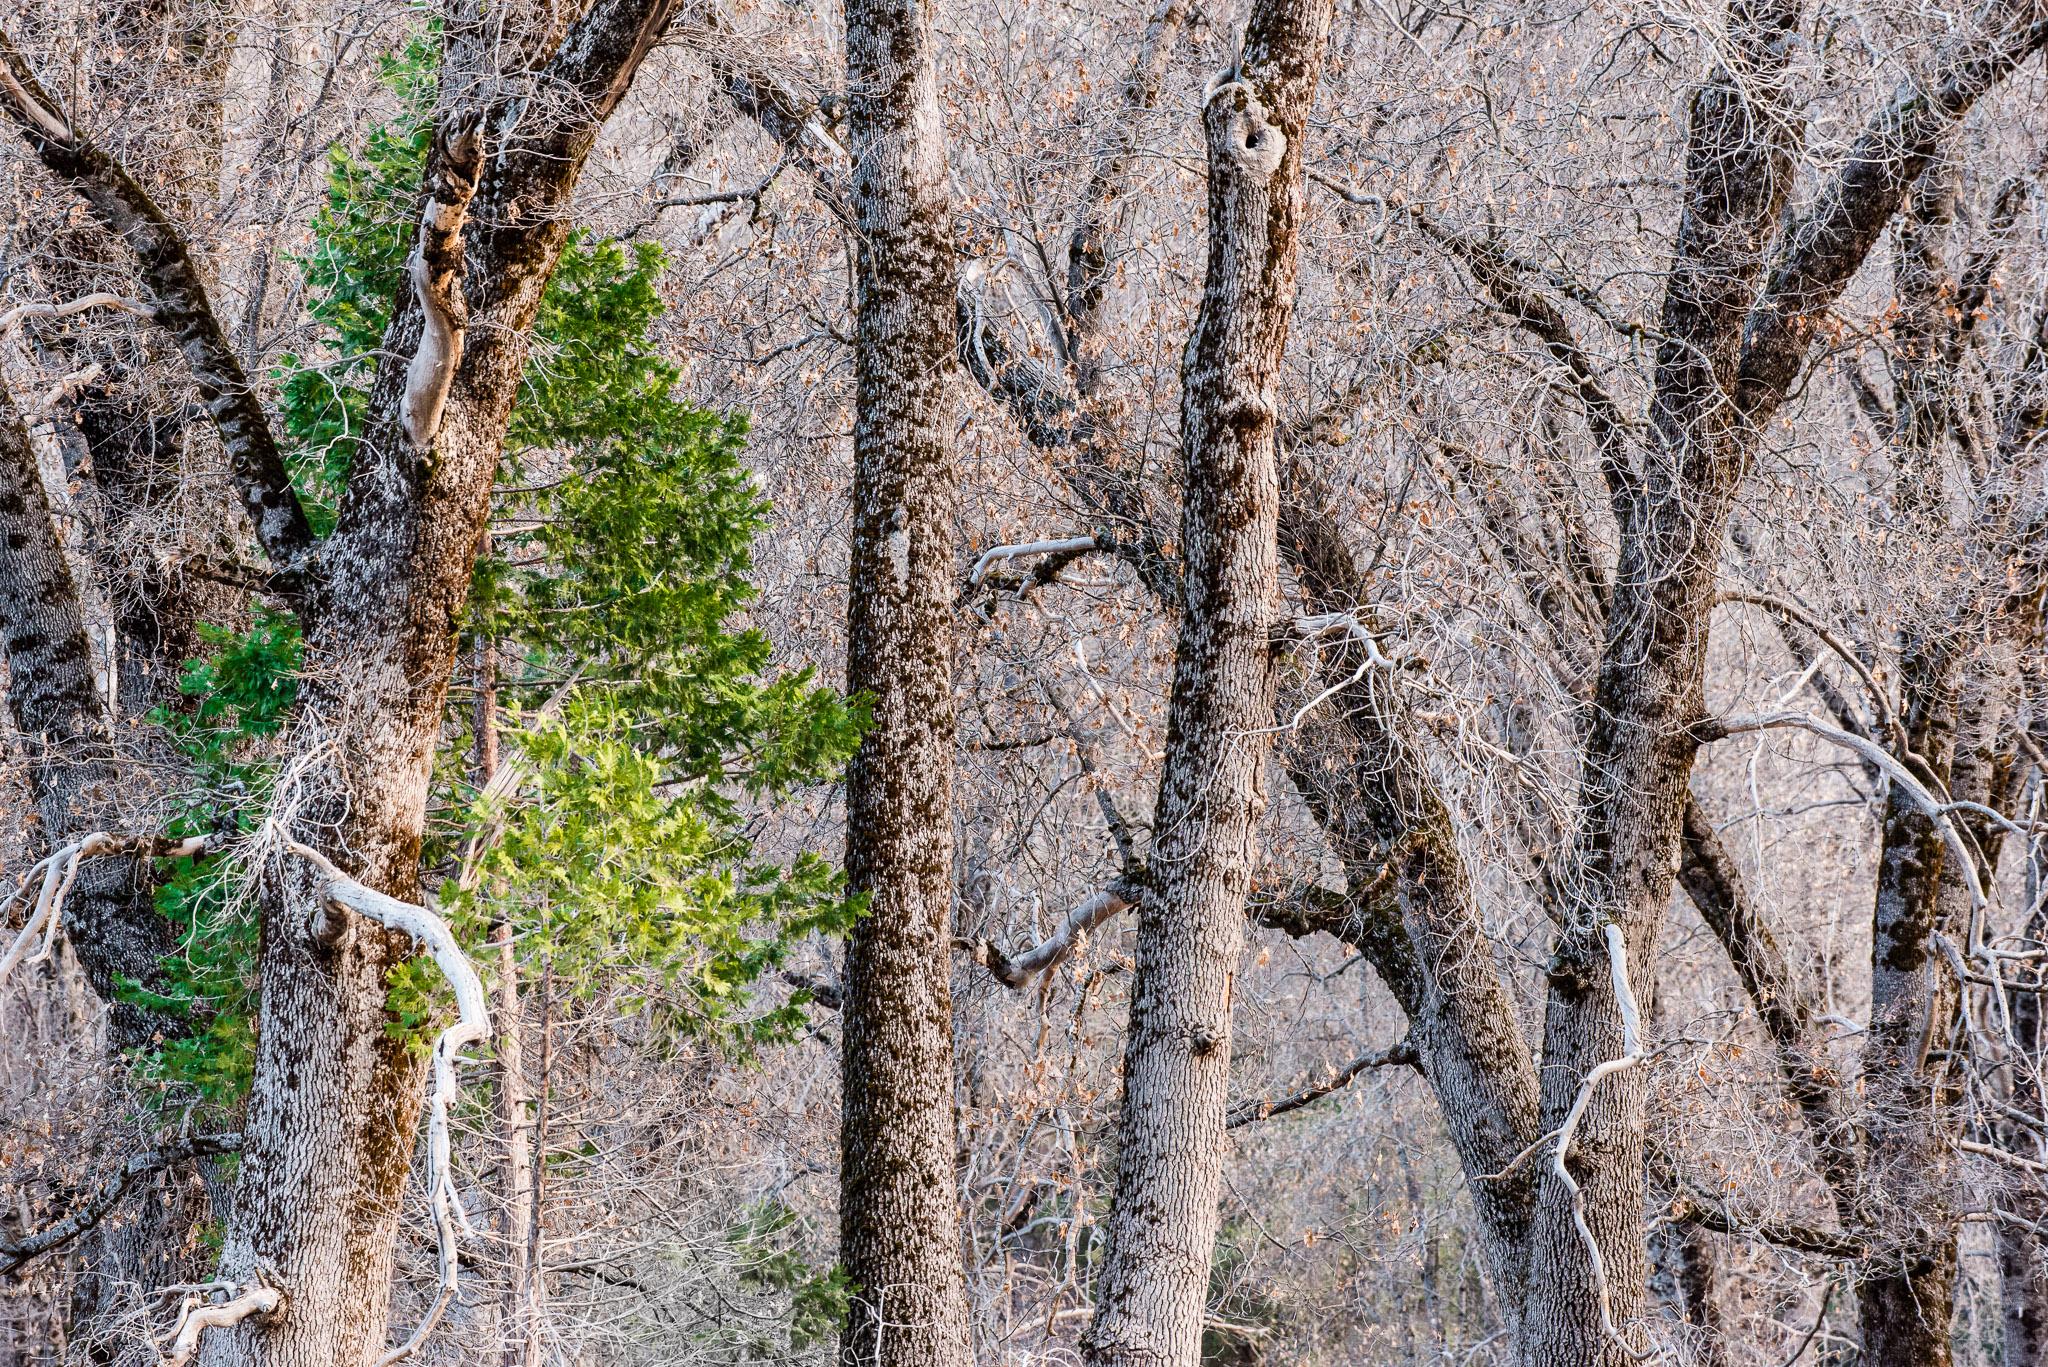 Jason-Davis-Images-Yosemite-0005.jpg